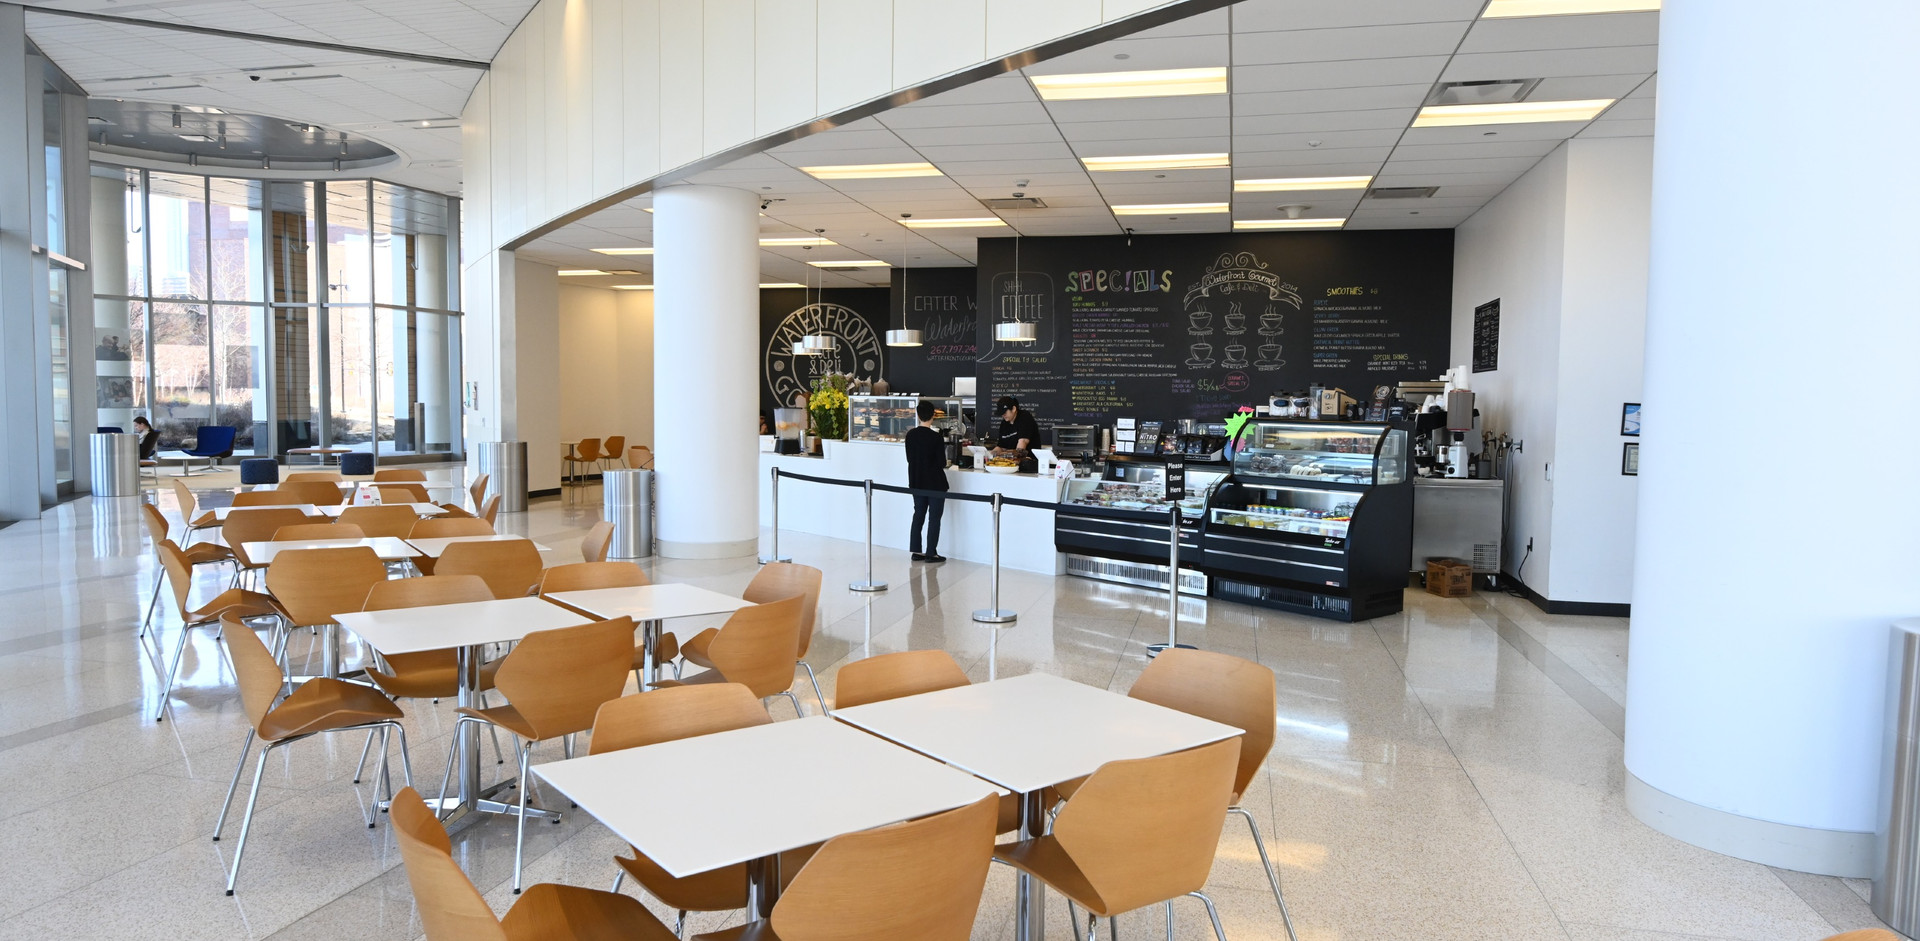 Waterfront_Gourmet_Café_at_CHOP1.jpg